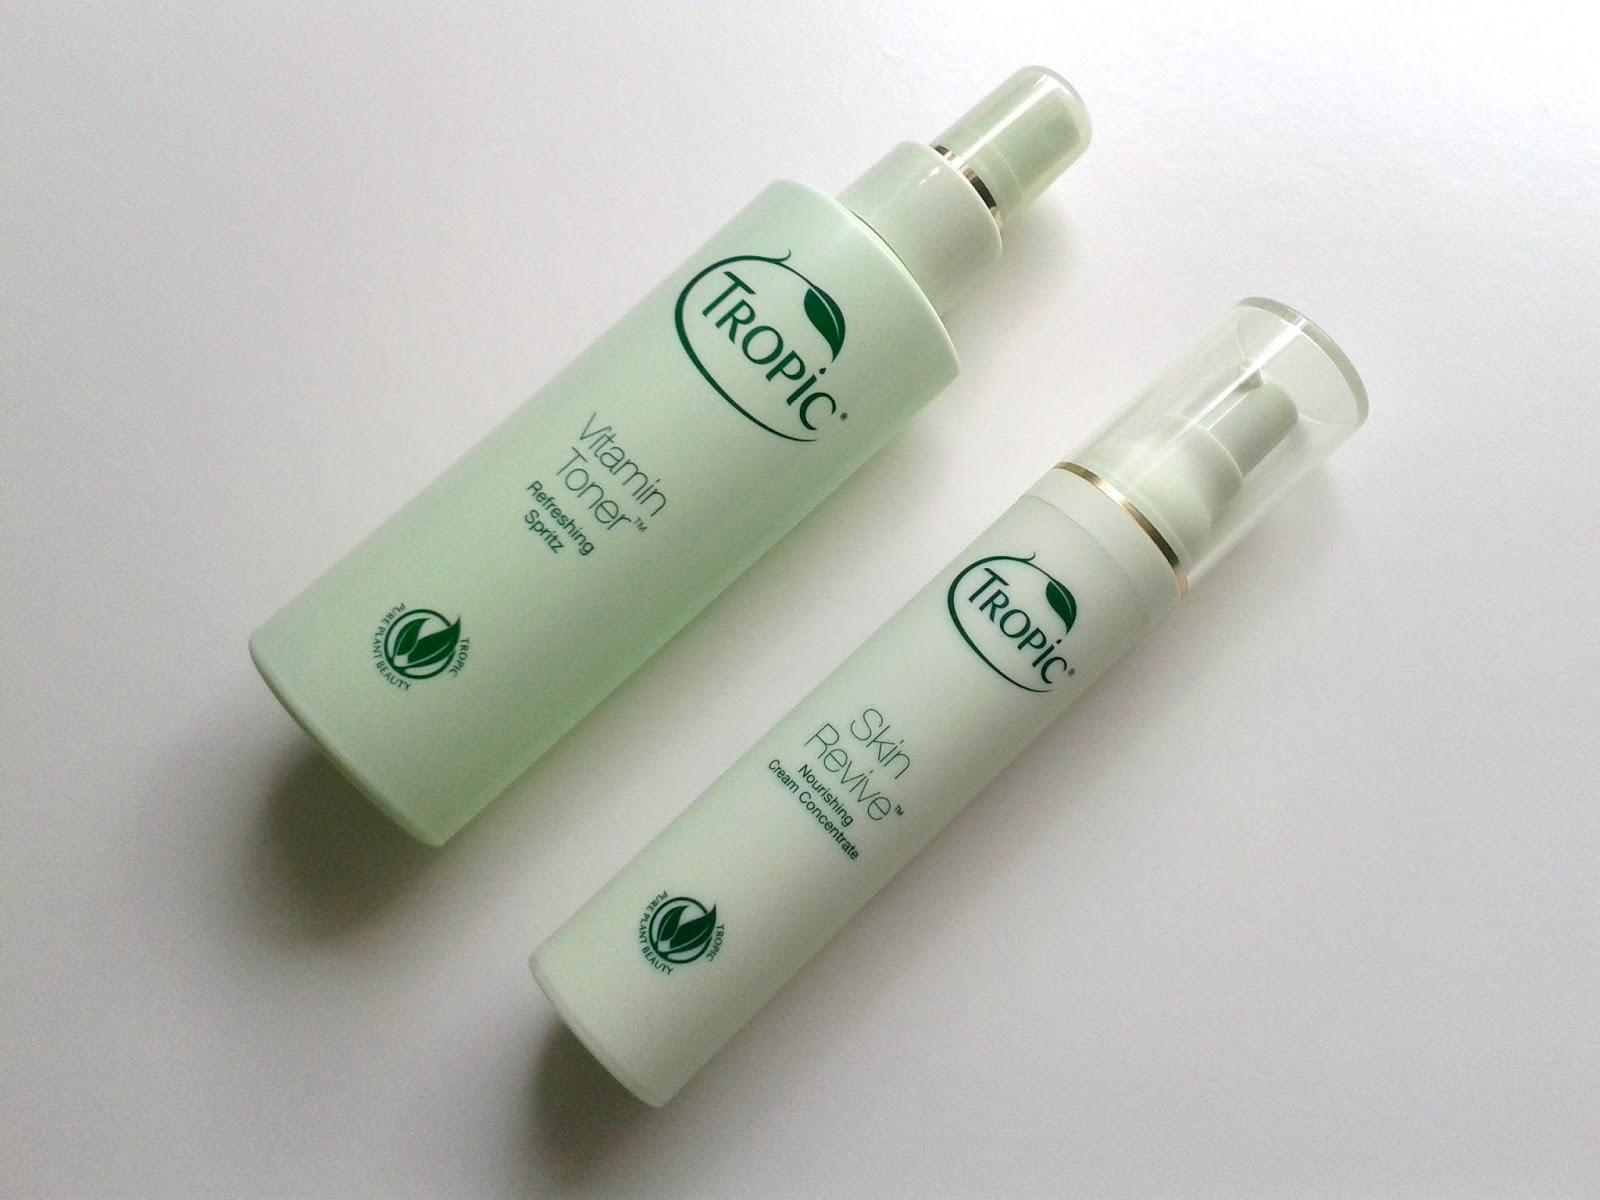 Tropic Skin Revive Firming Nourishing Cream Tropic Vitamin Toner Skincare Beauty Review